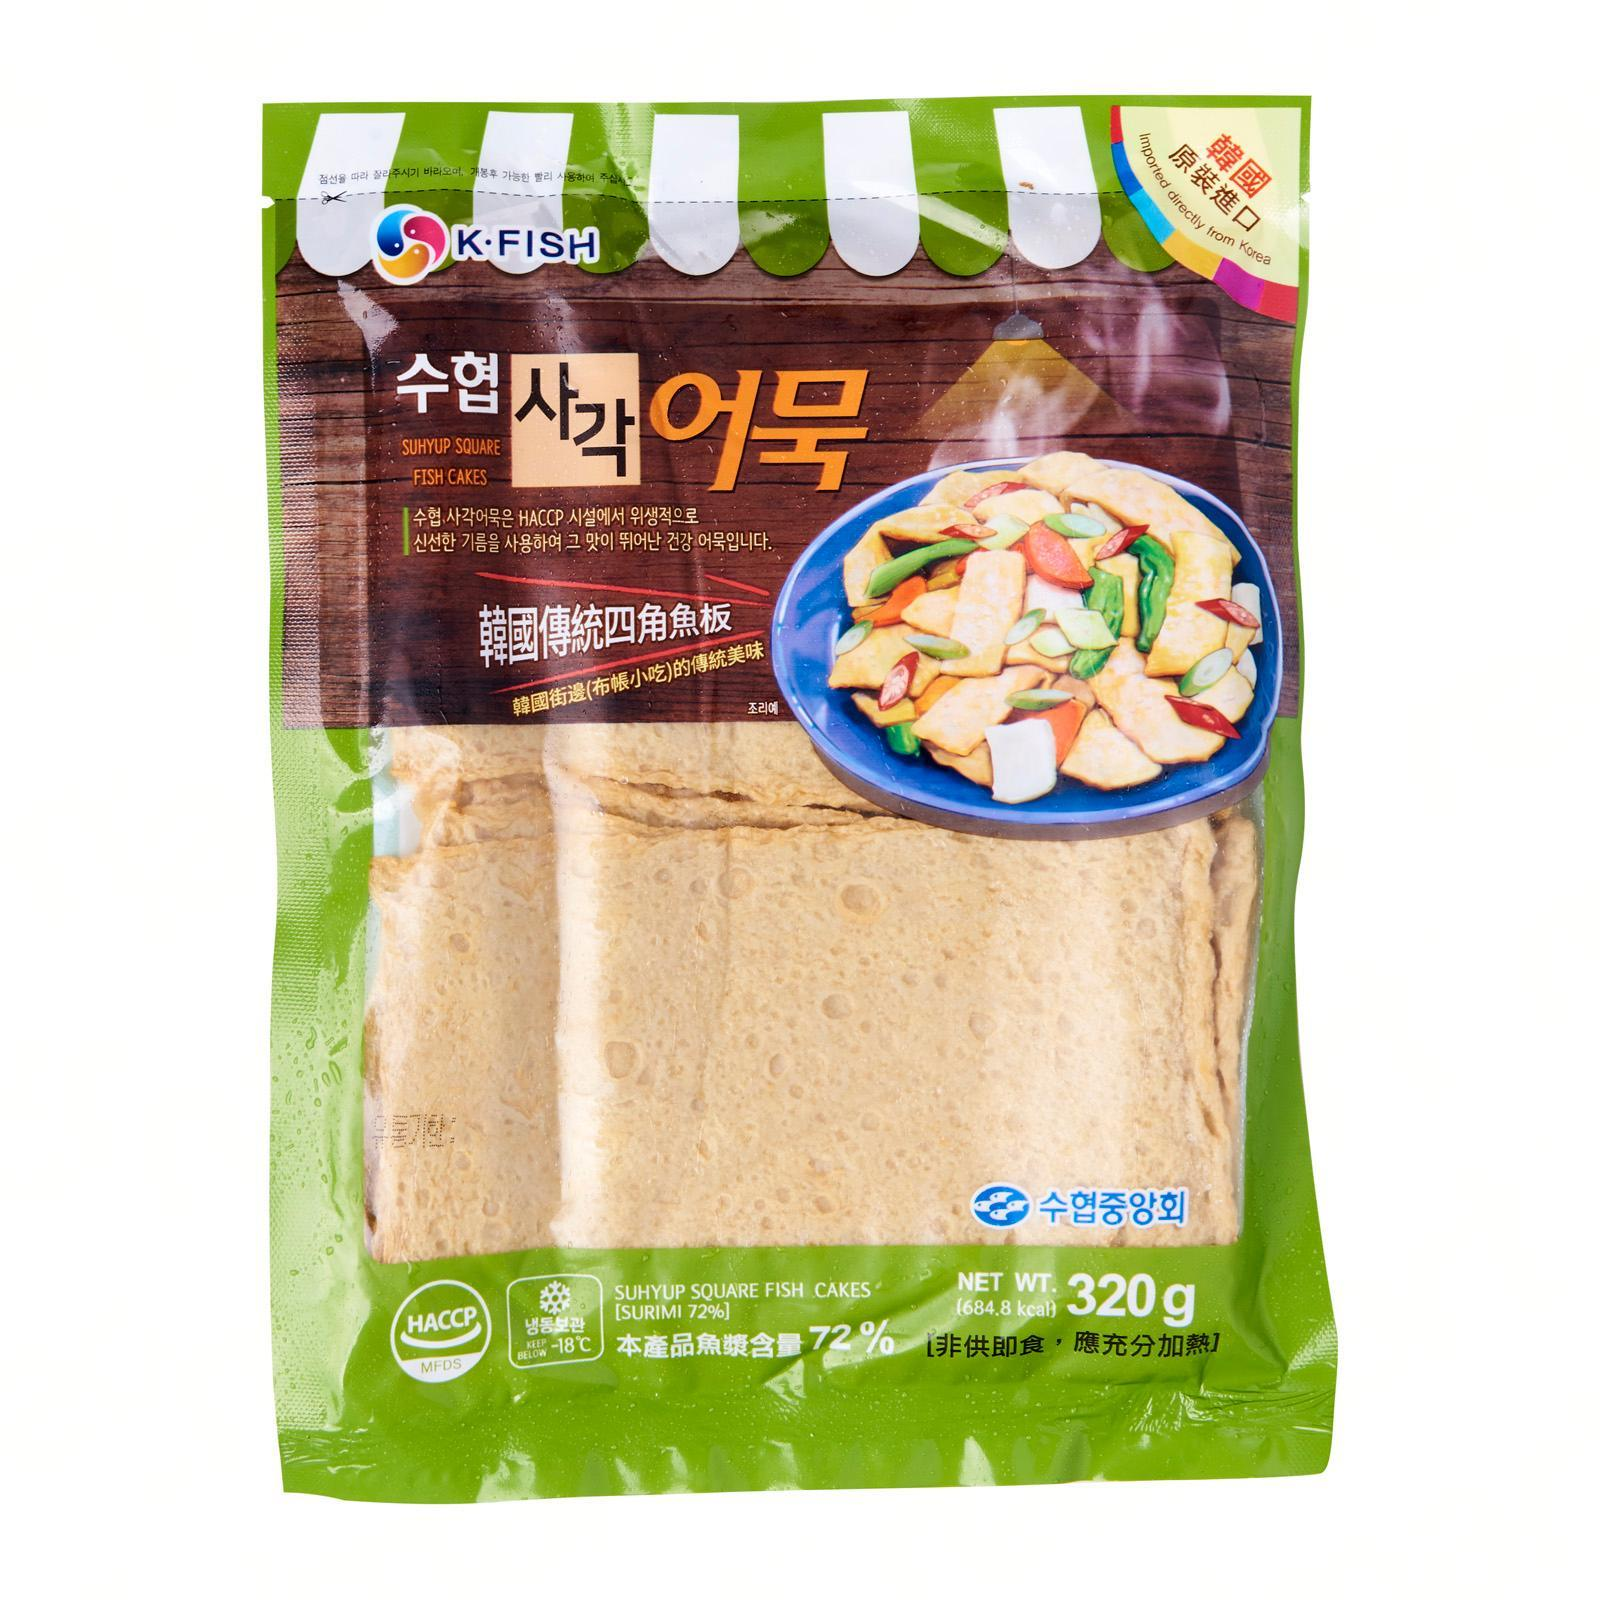 Suhyup Square Korean Fish Cake - Frozen